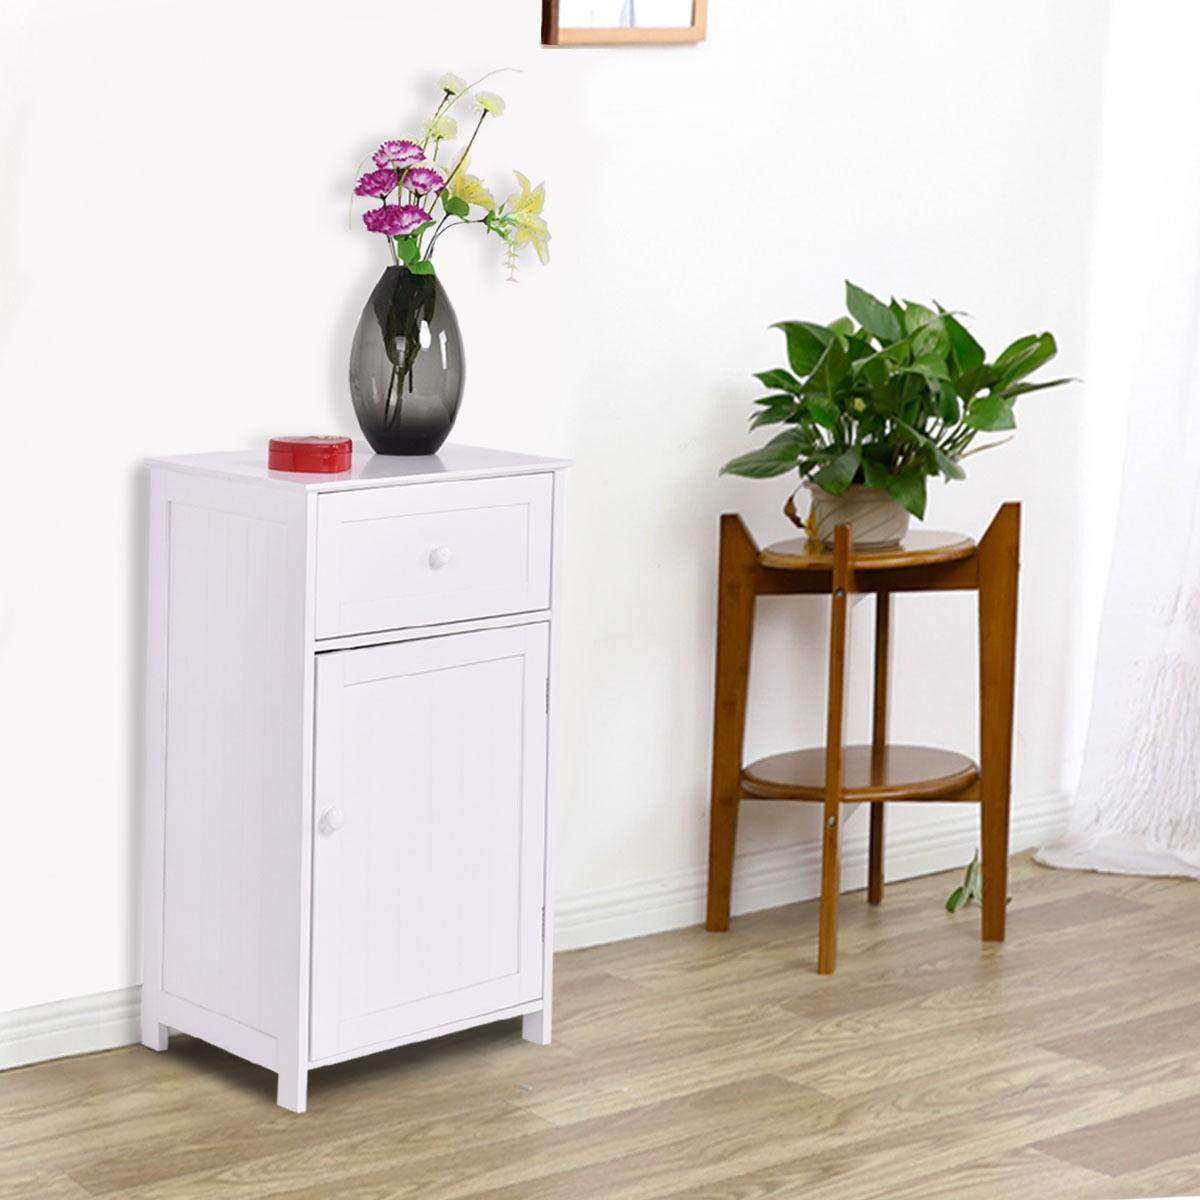 Bathroom Storage Cabinet Floor Stand White Wood Furniture